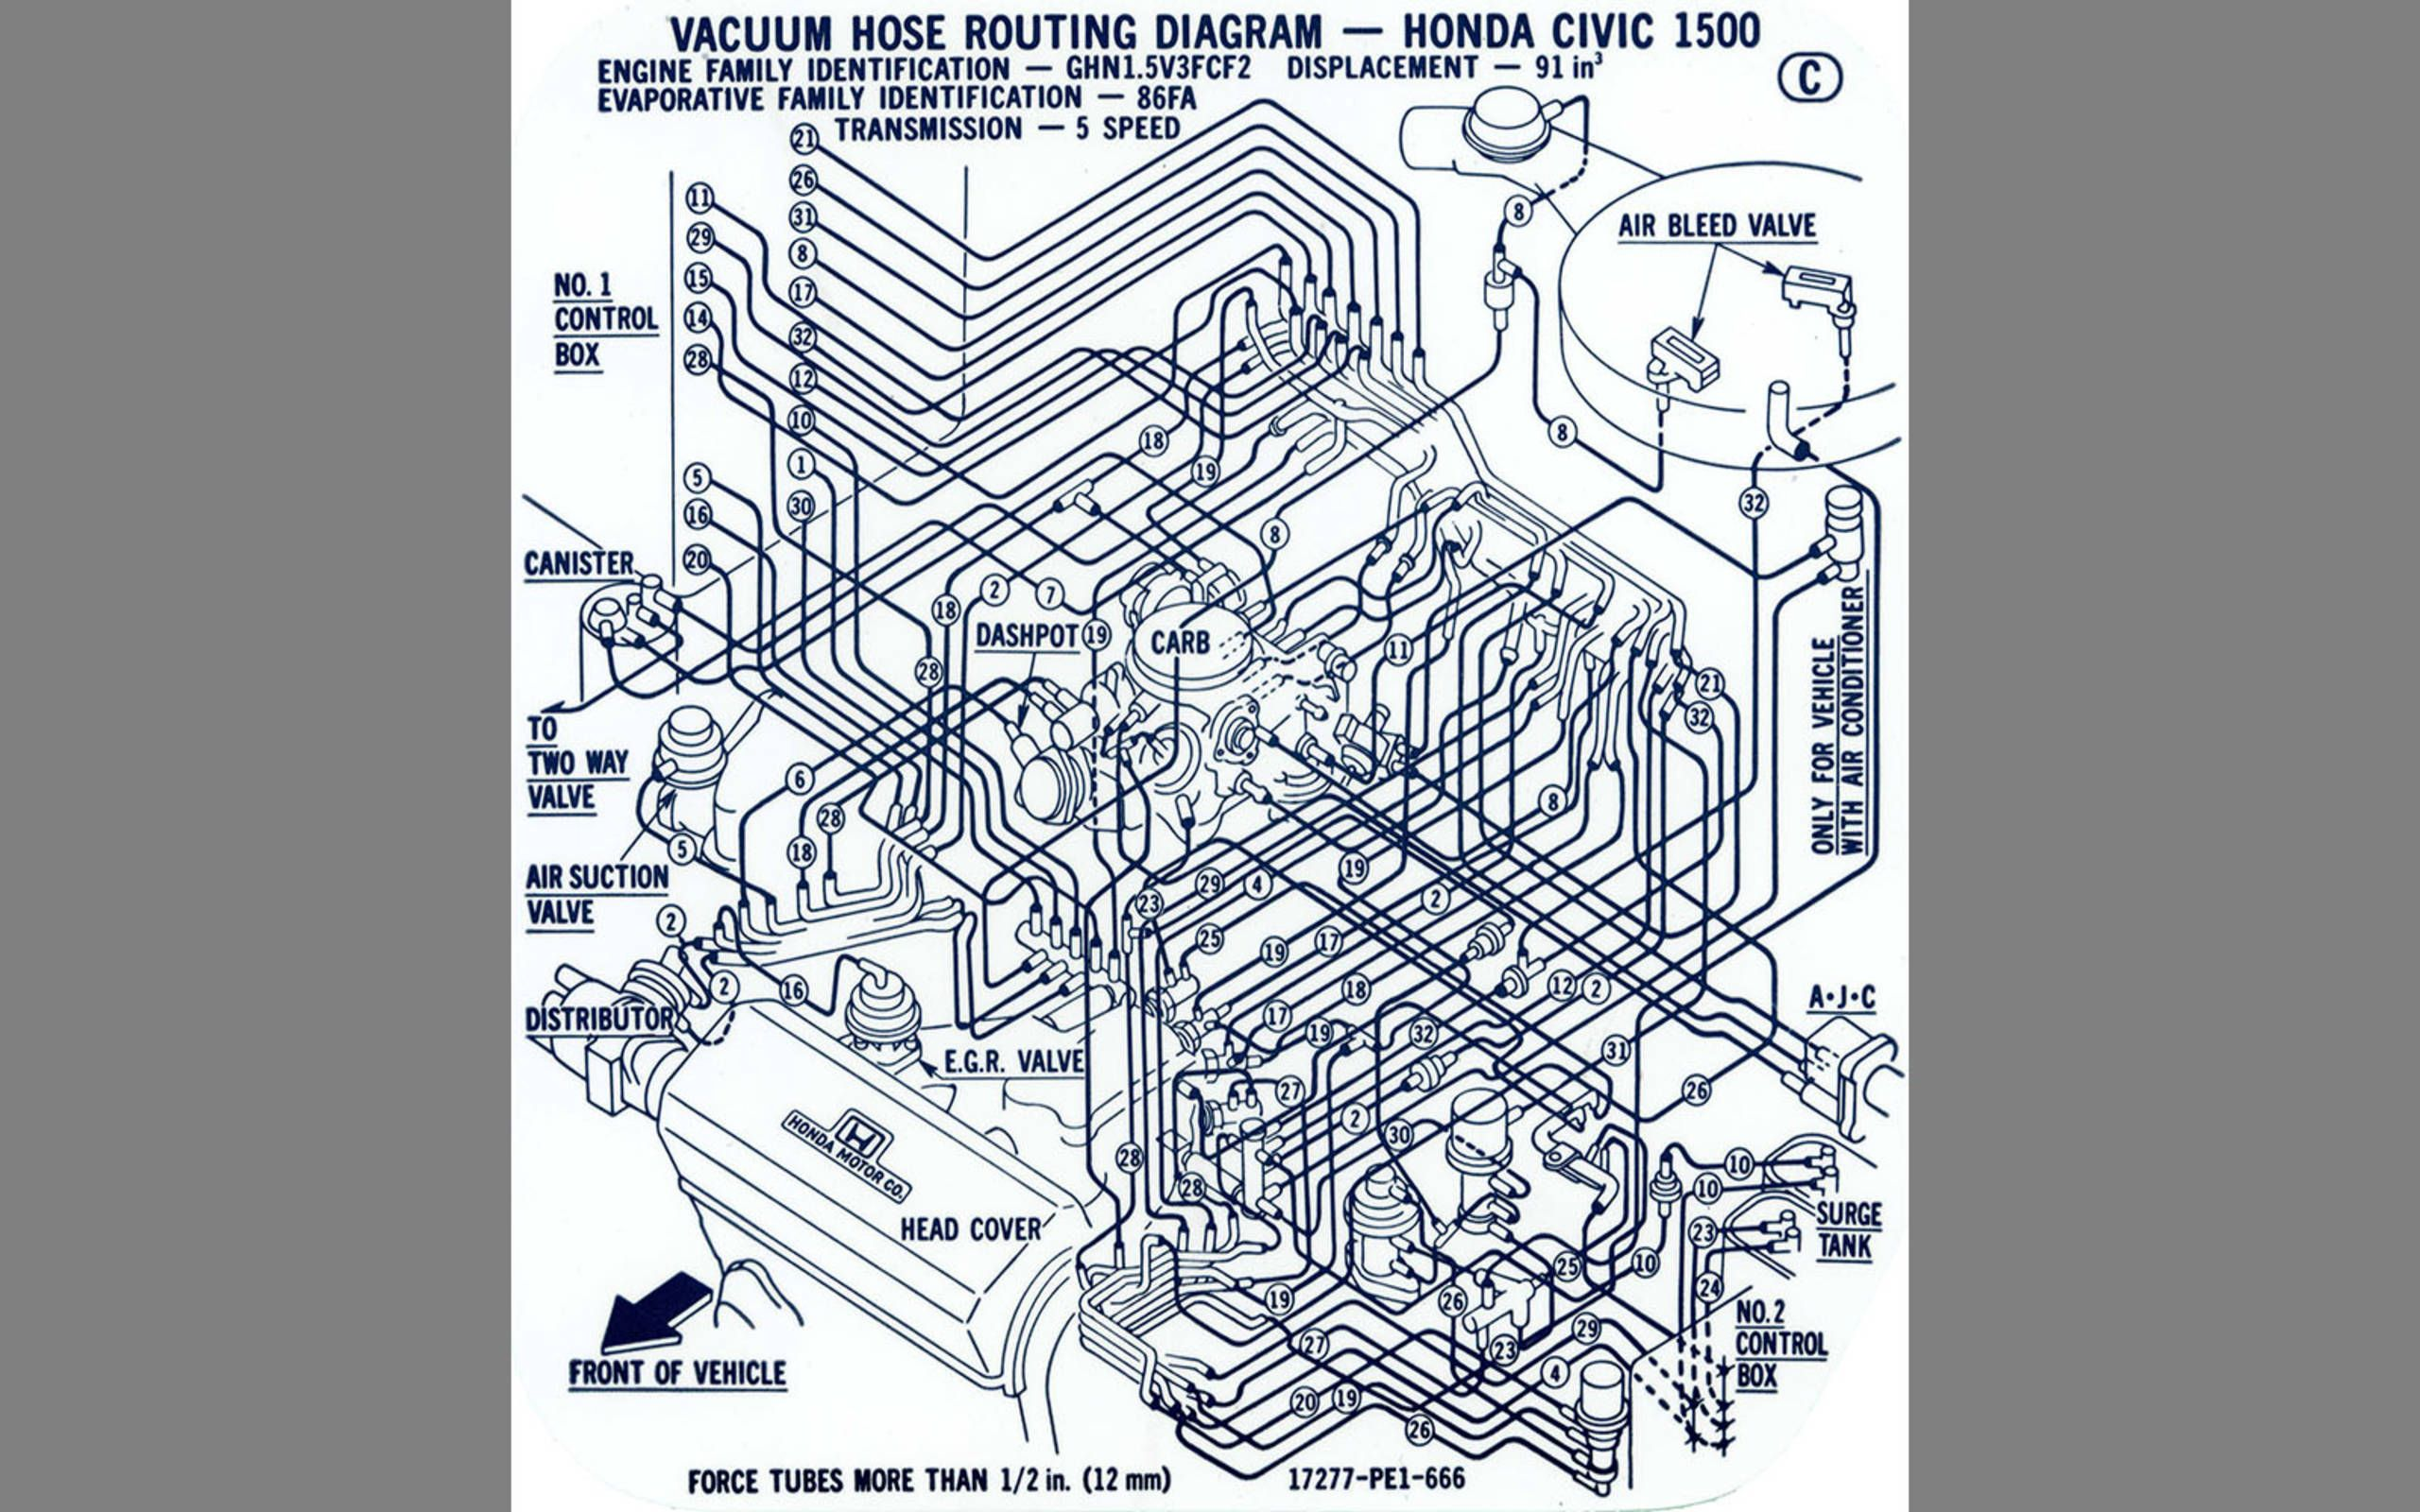 a close look at the nightmare 1980s honda cvcc vacuum hose tangle  autoweek